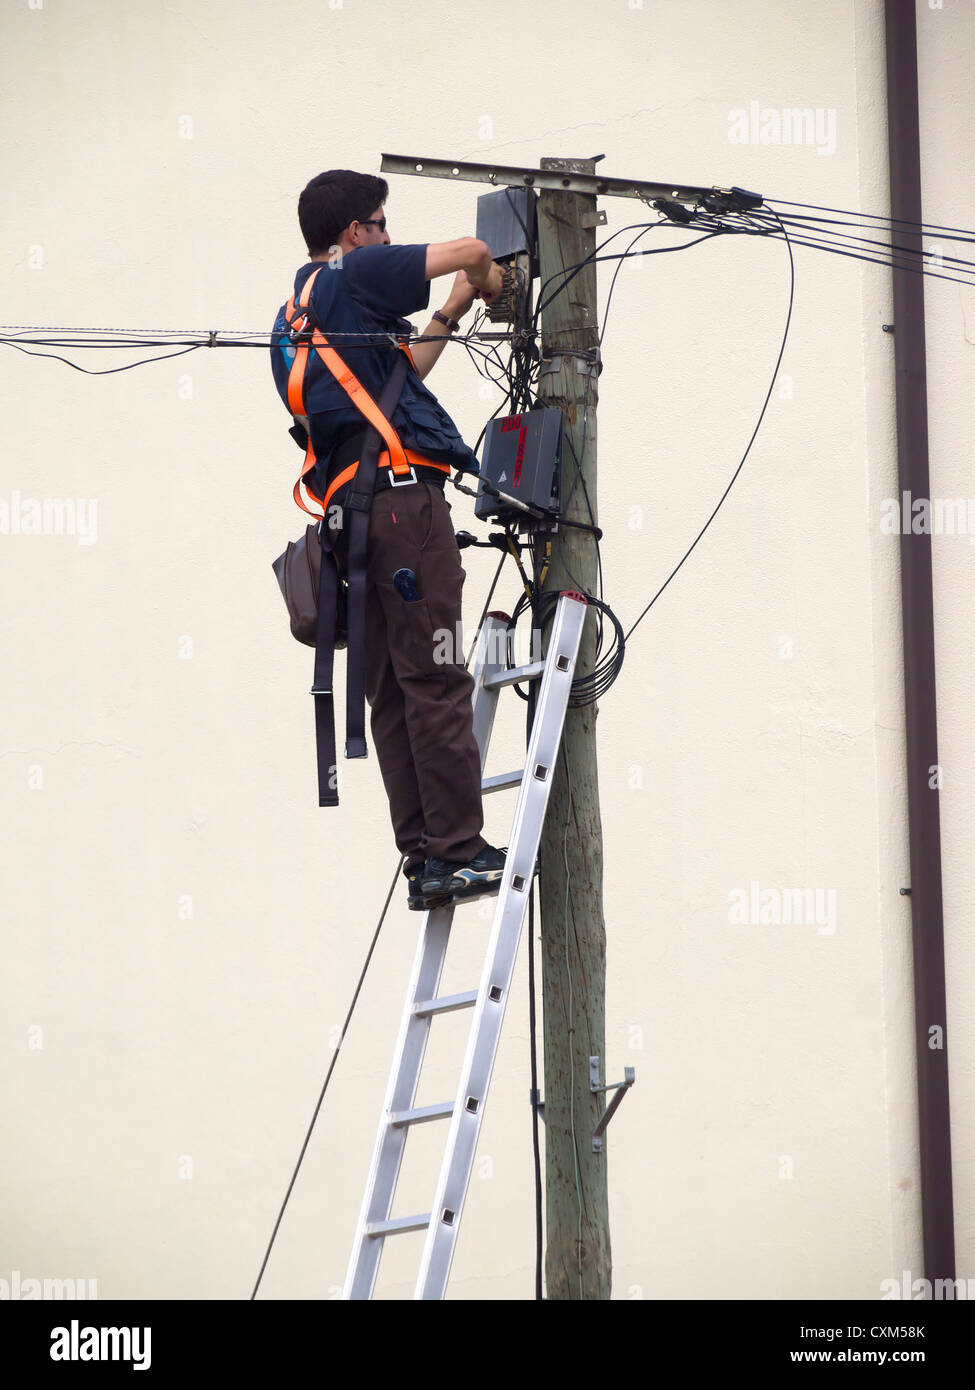 technician installing fiber optic broadband internet on a